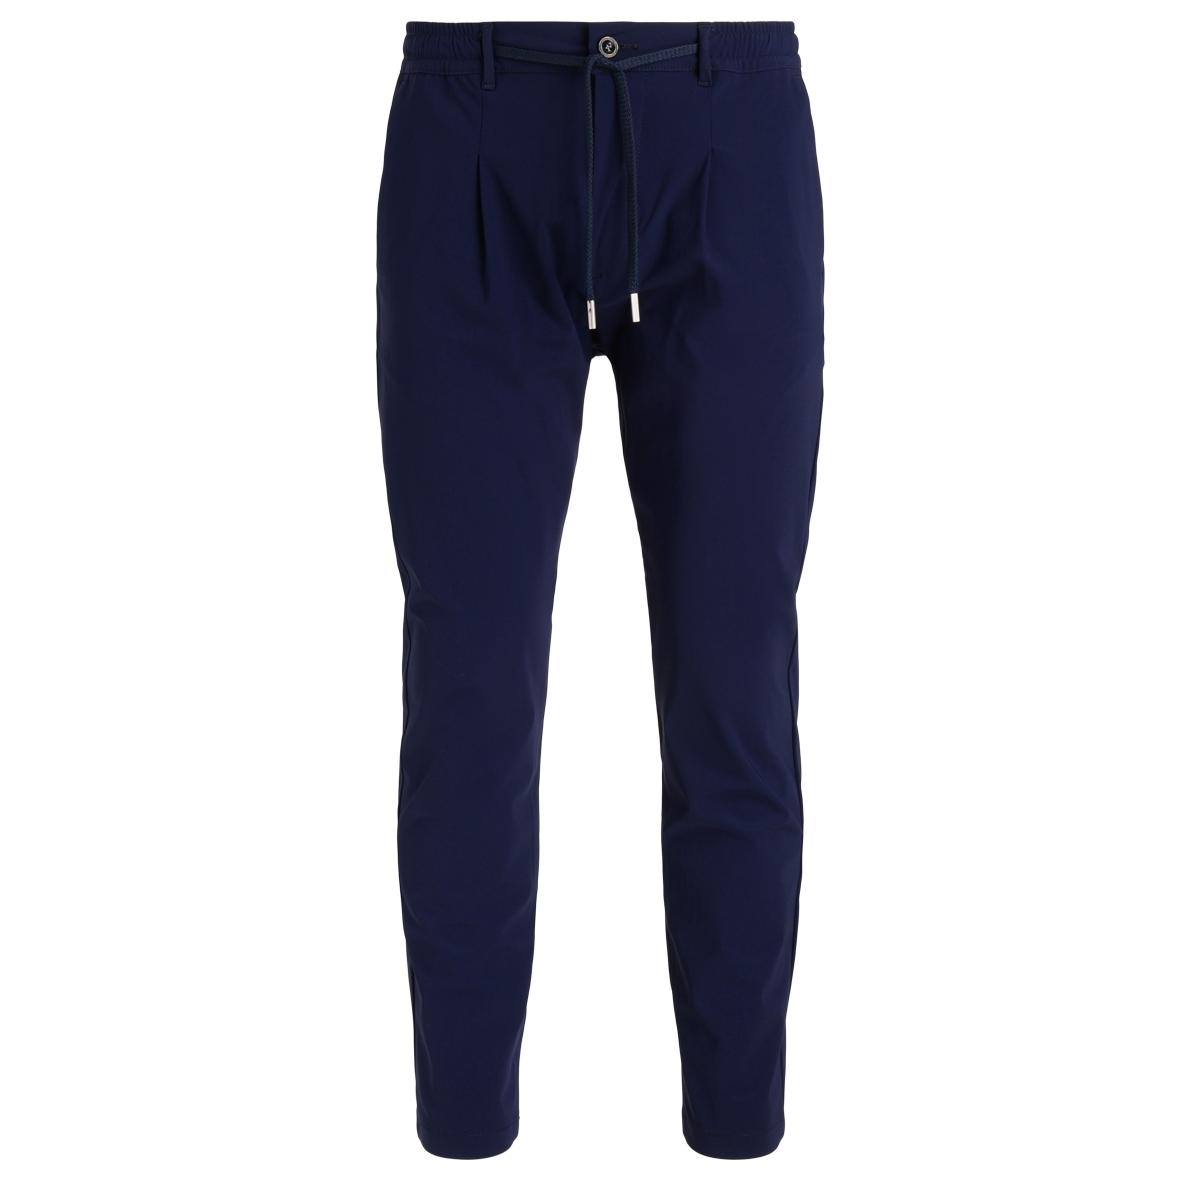 Pantalon Mitte en jersey technique militaire - CRUNA - Modalova